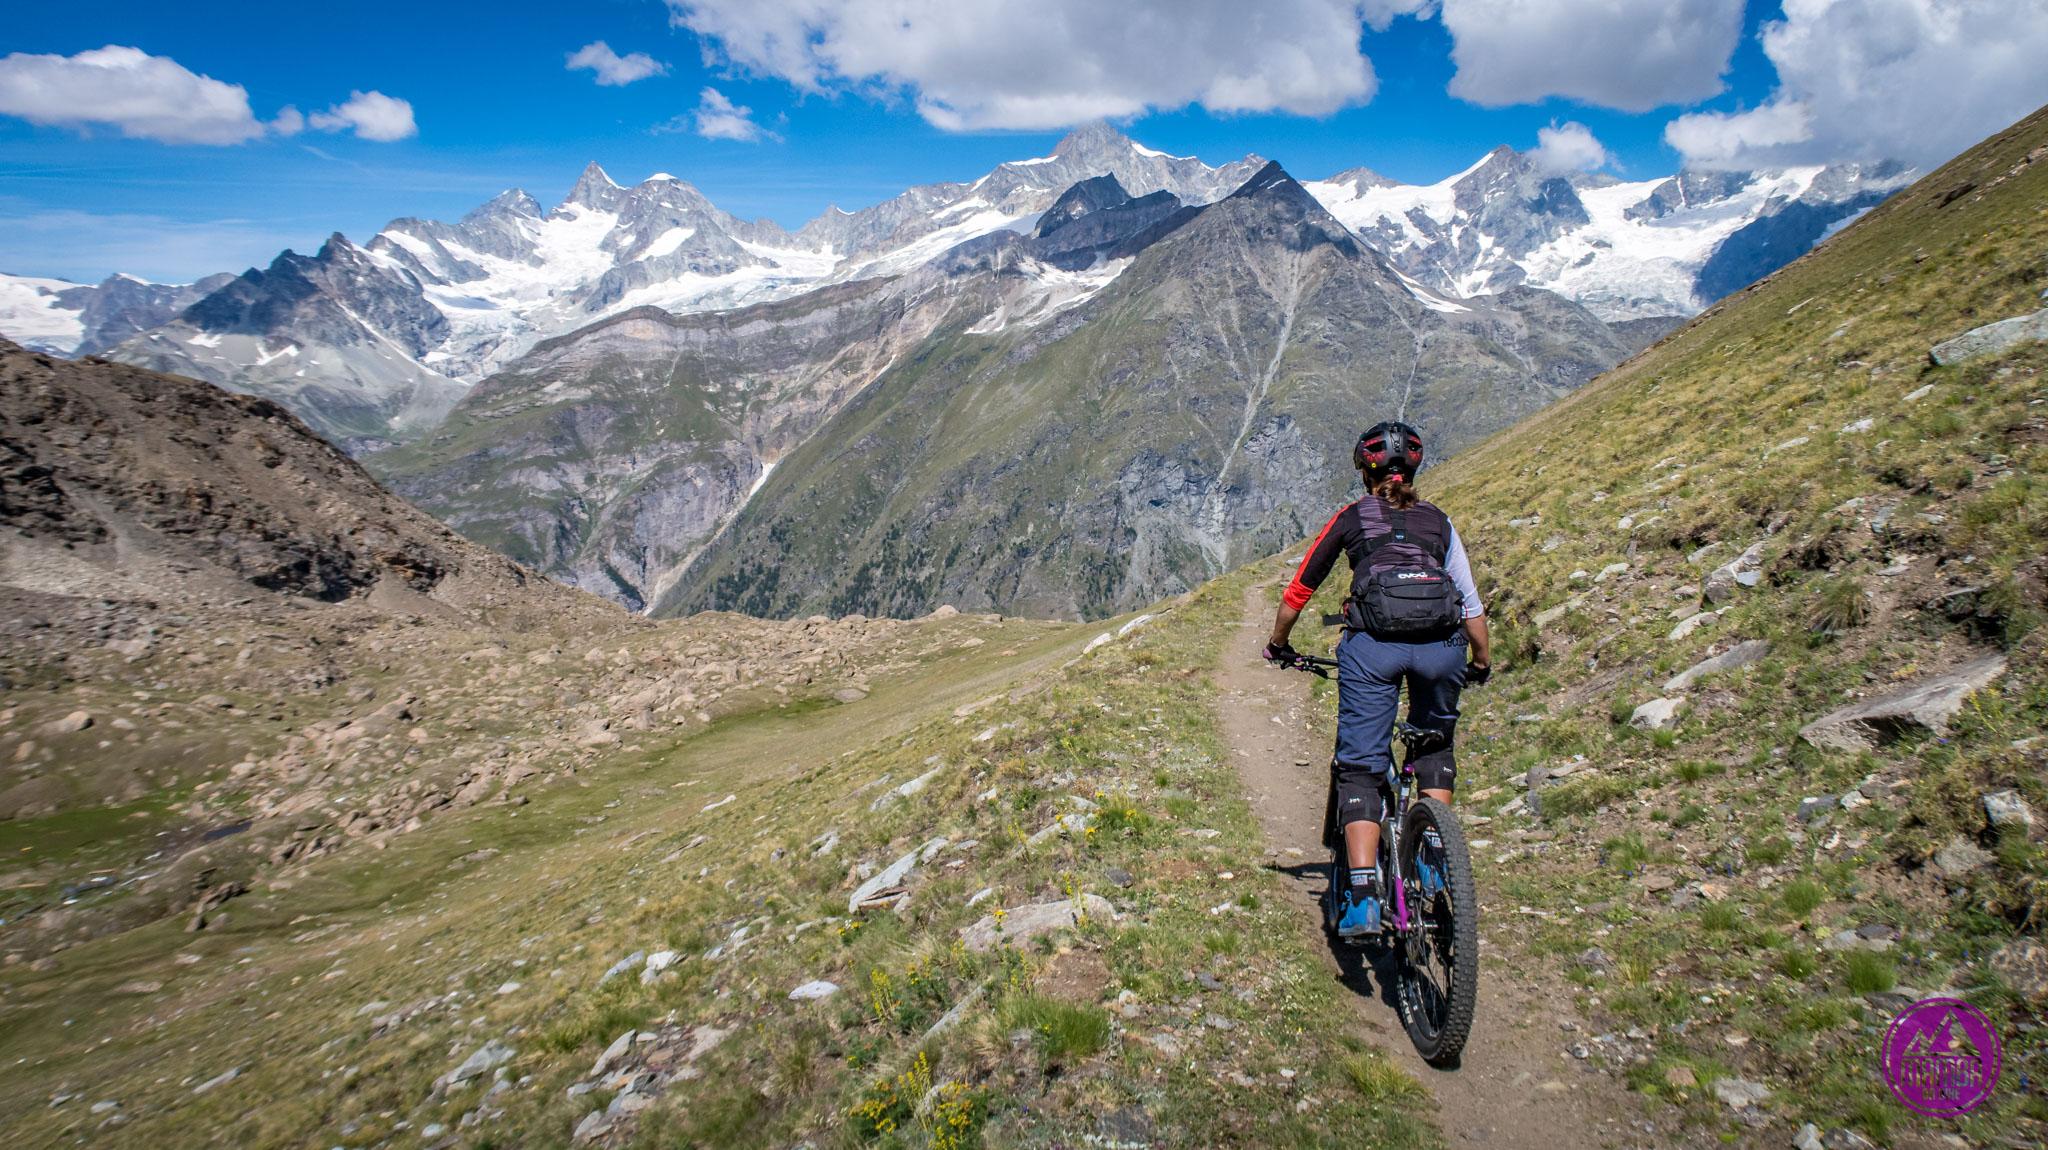 Heli biking Zermatt - zjazd